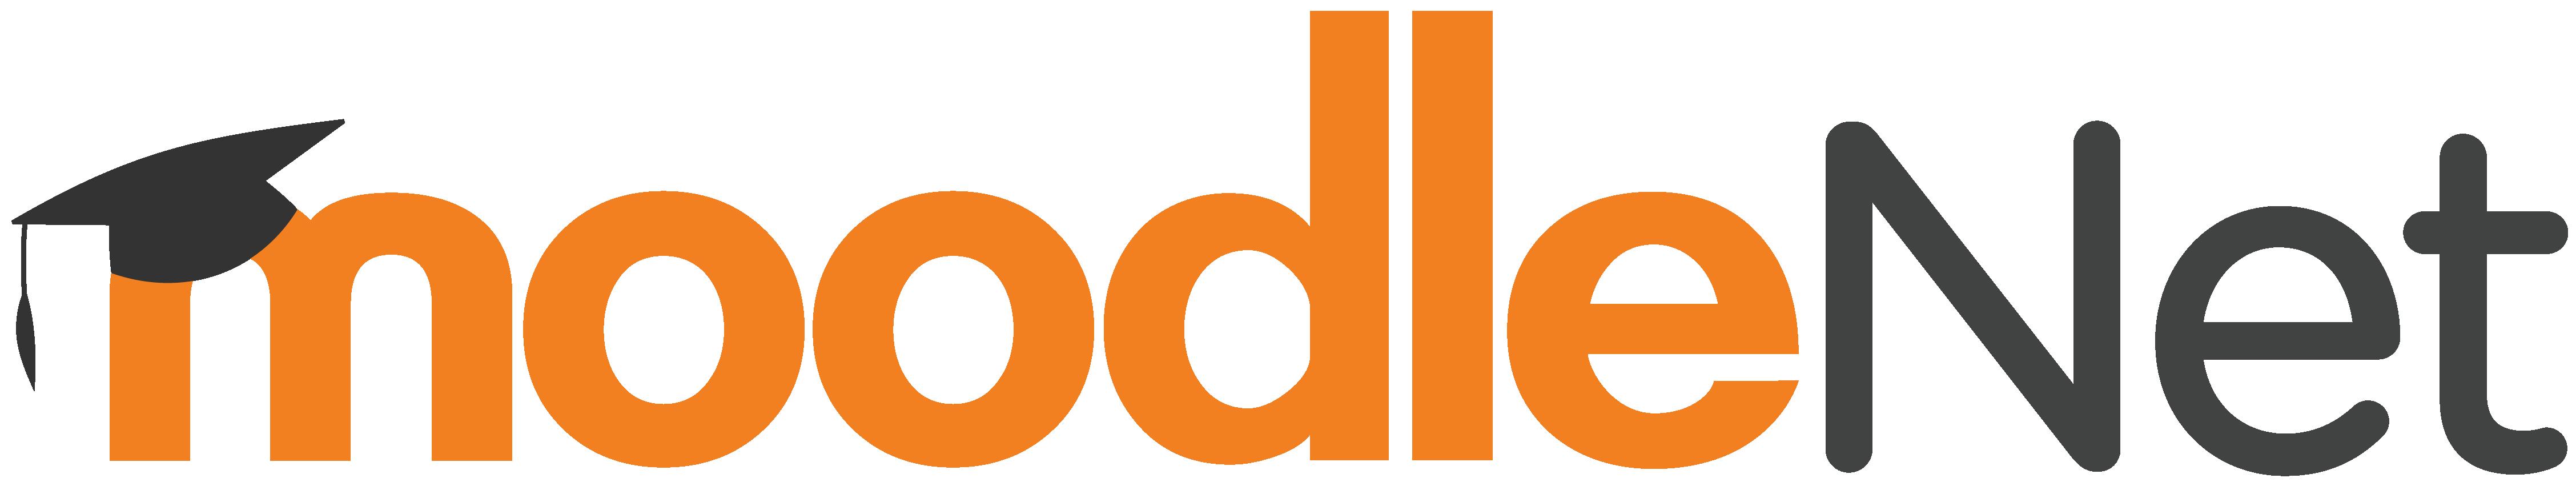 static/images/logos/moodlenet-logo.png